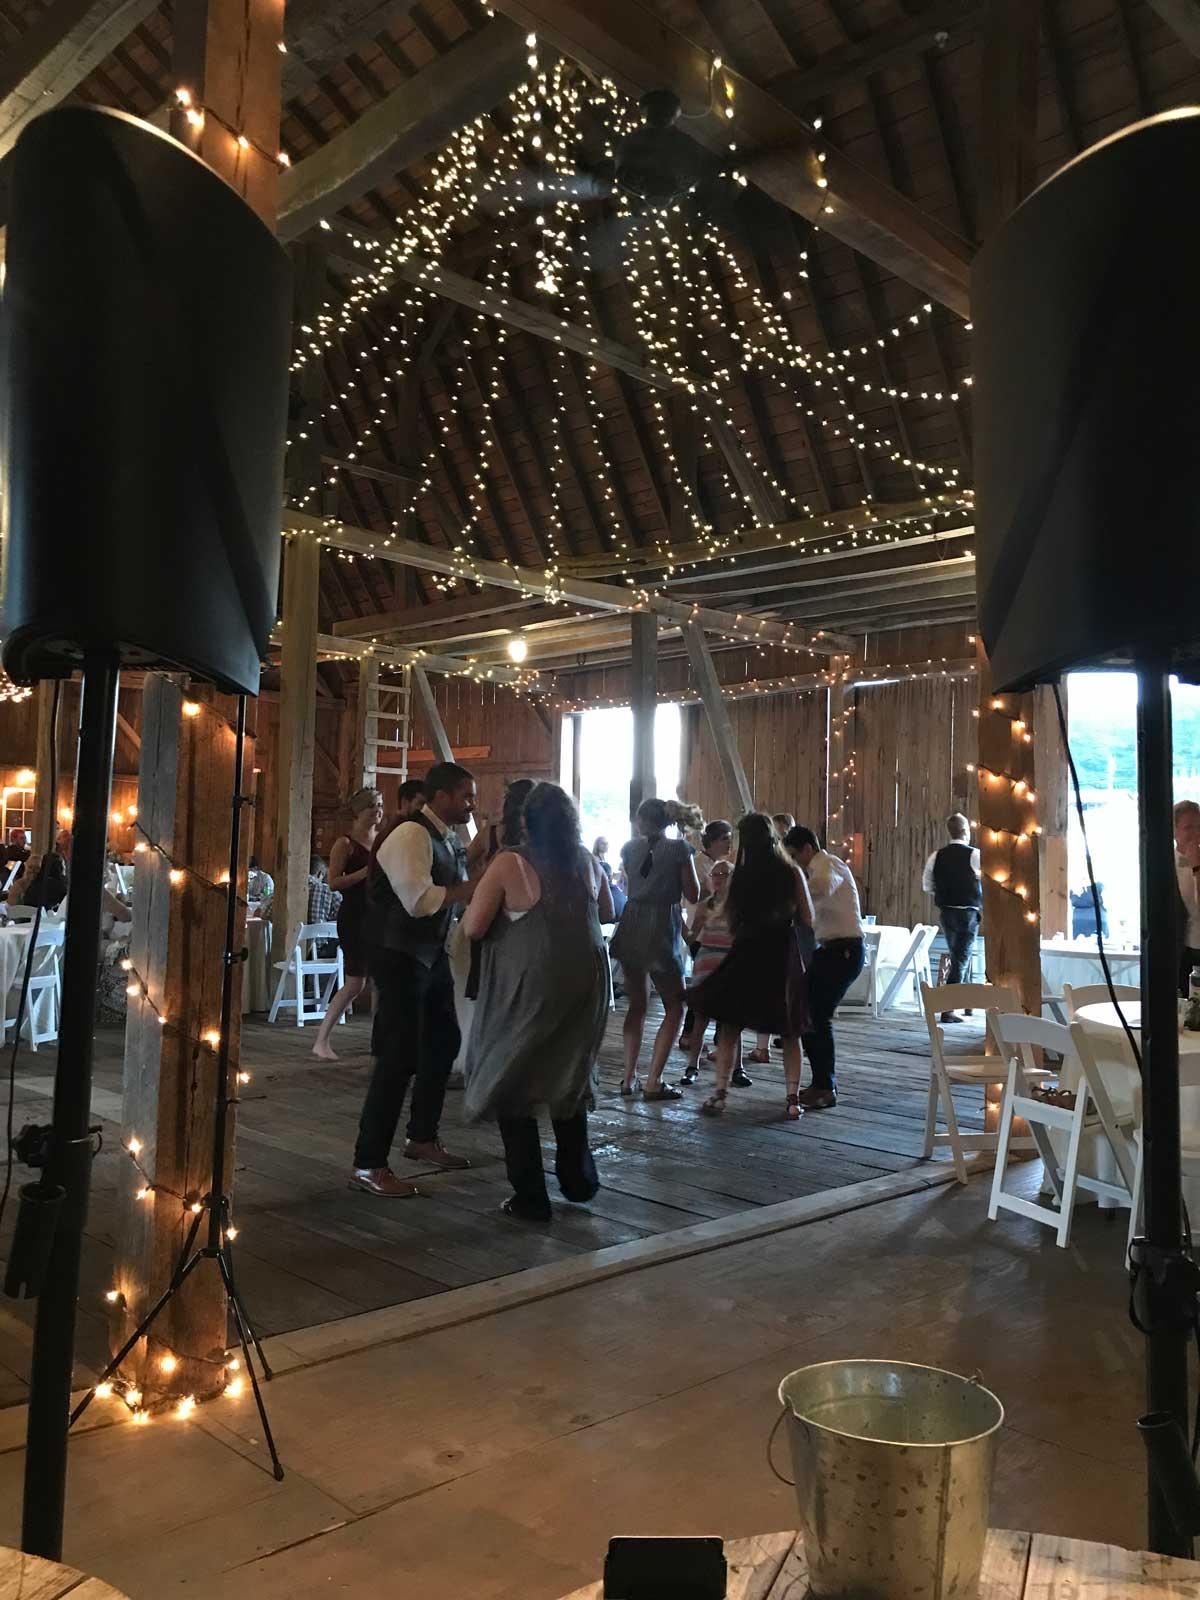 Norman Networking - People Dancing at Barn Wedding